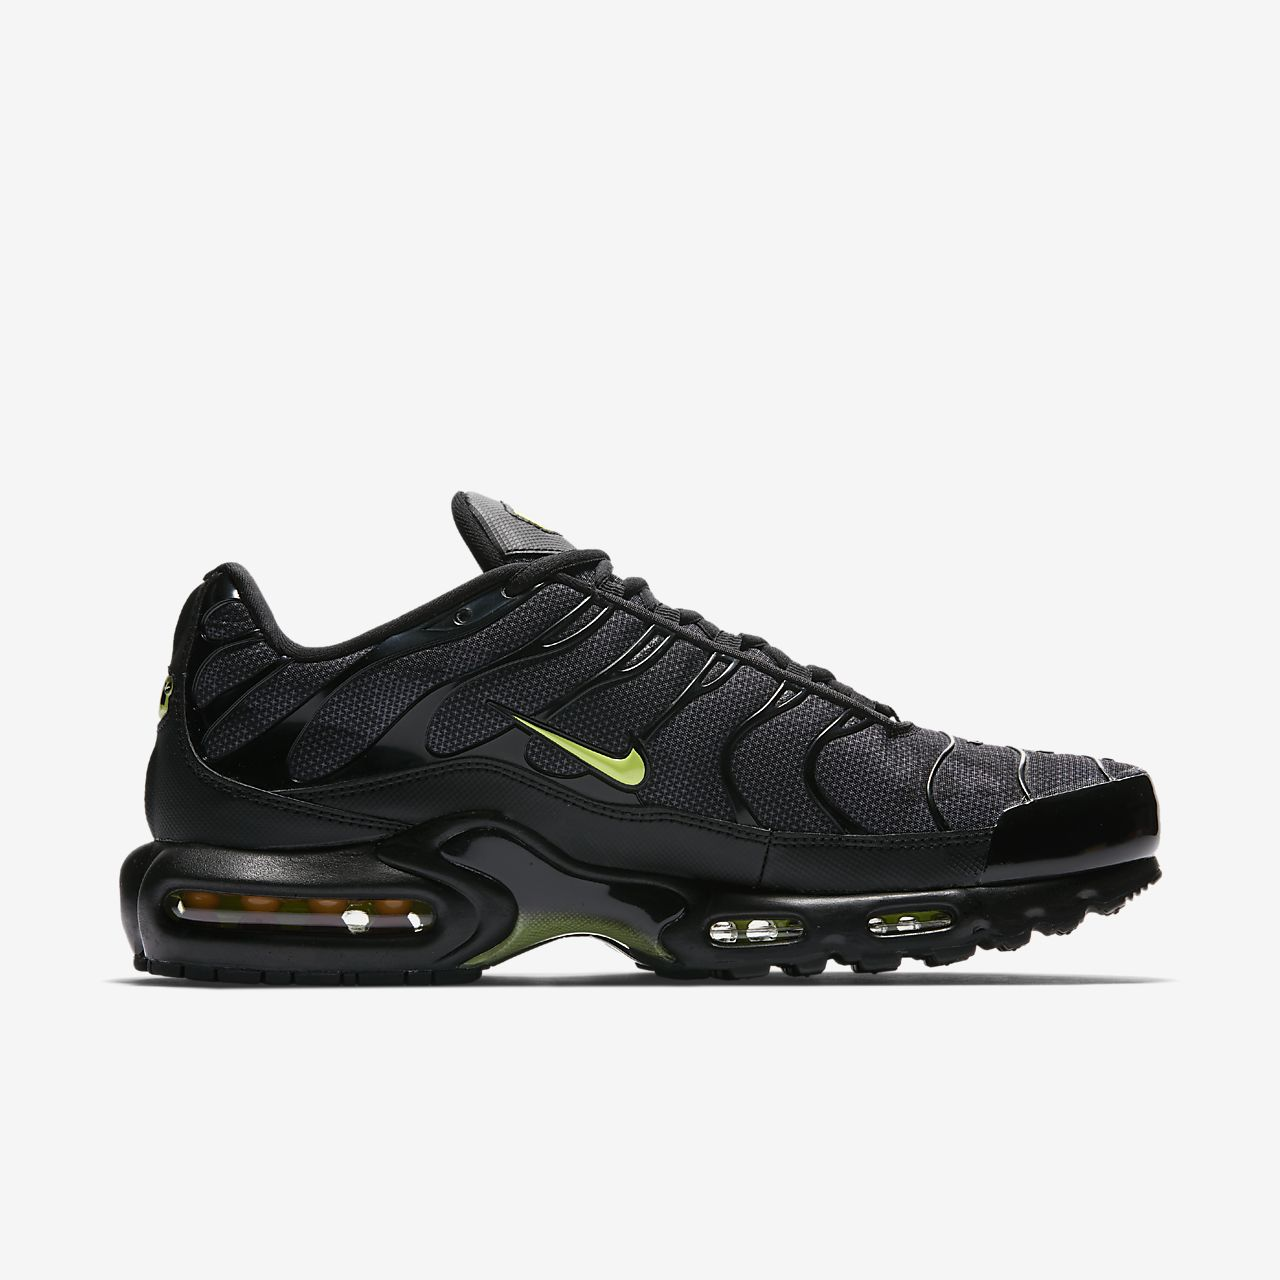 Se Nike Homme Chaussure Air Max Plus Pour CxBdoe